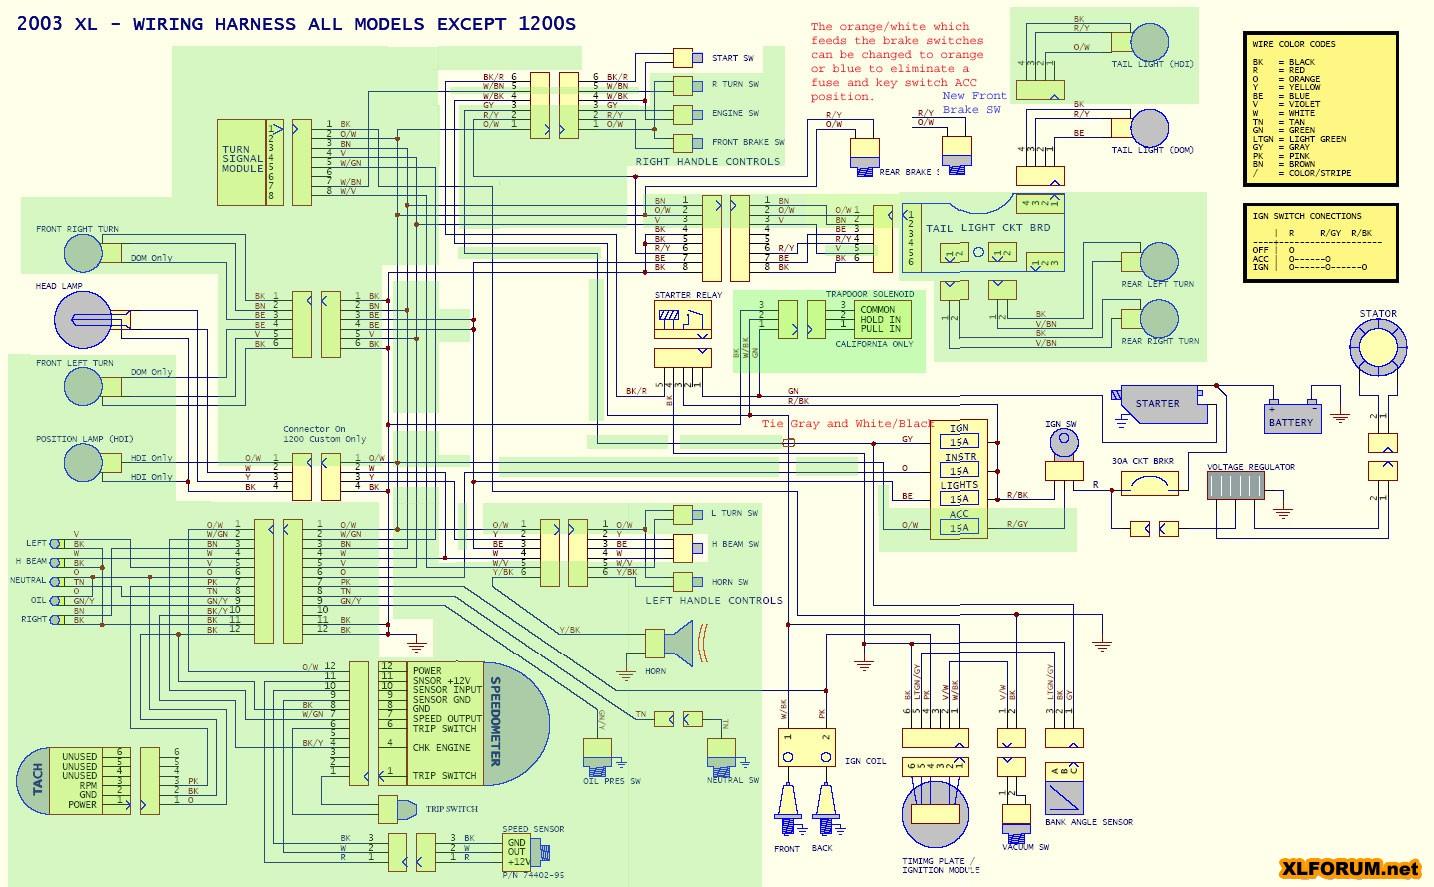 Hensim 50cc Wire Diagram Schematics Wiring Diagrams Atv Harley Davidson Sportster Pdf Efcaviation Com Dirt Bike Four Wheeler